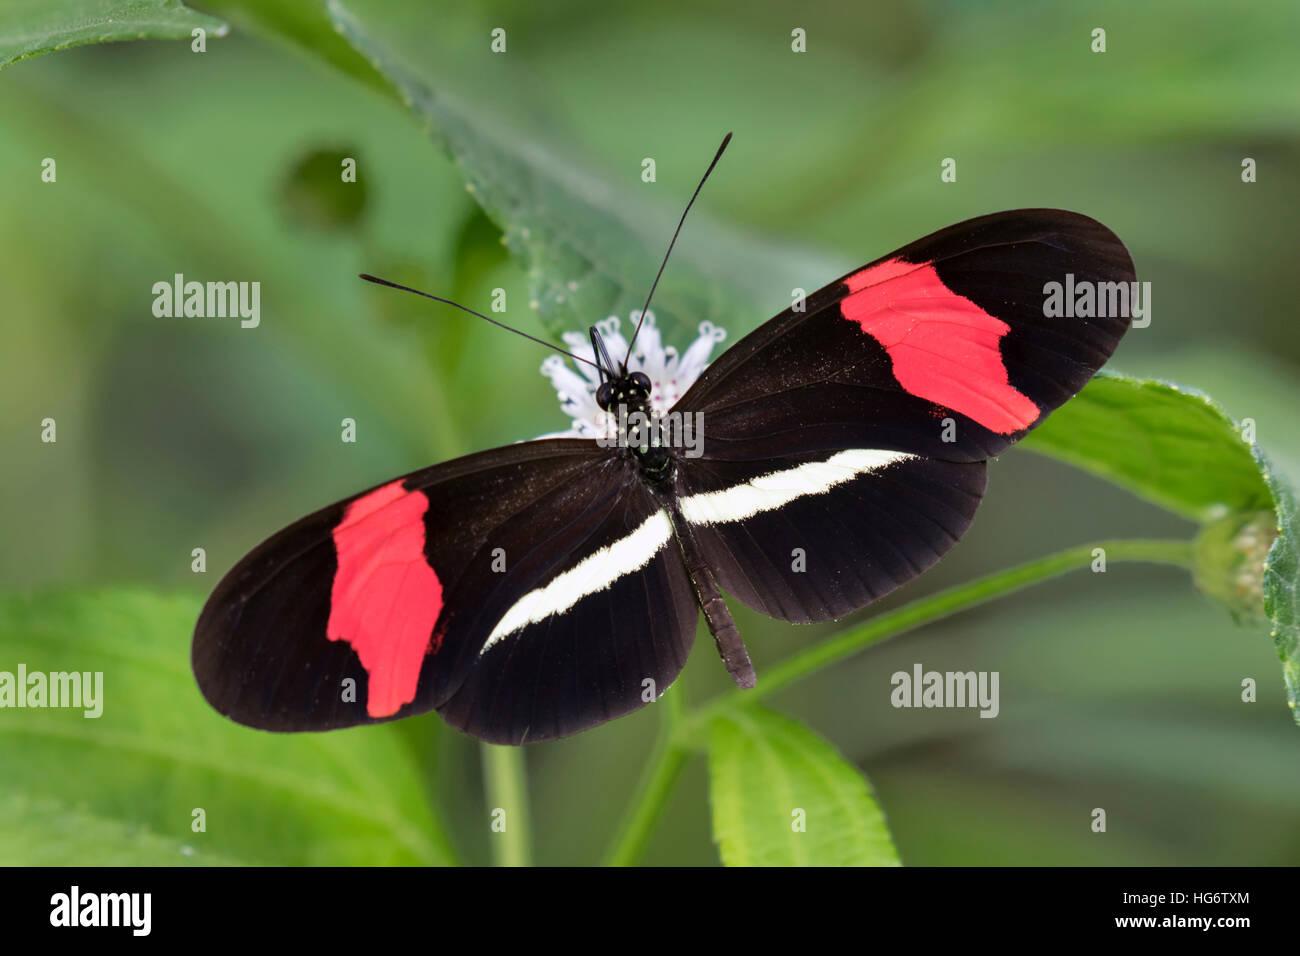 Cartero rojo butterfly (Heliconius erato) alimentándose de una flor, Belice, Centroamérica Imagen De Stock